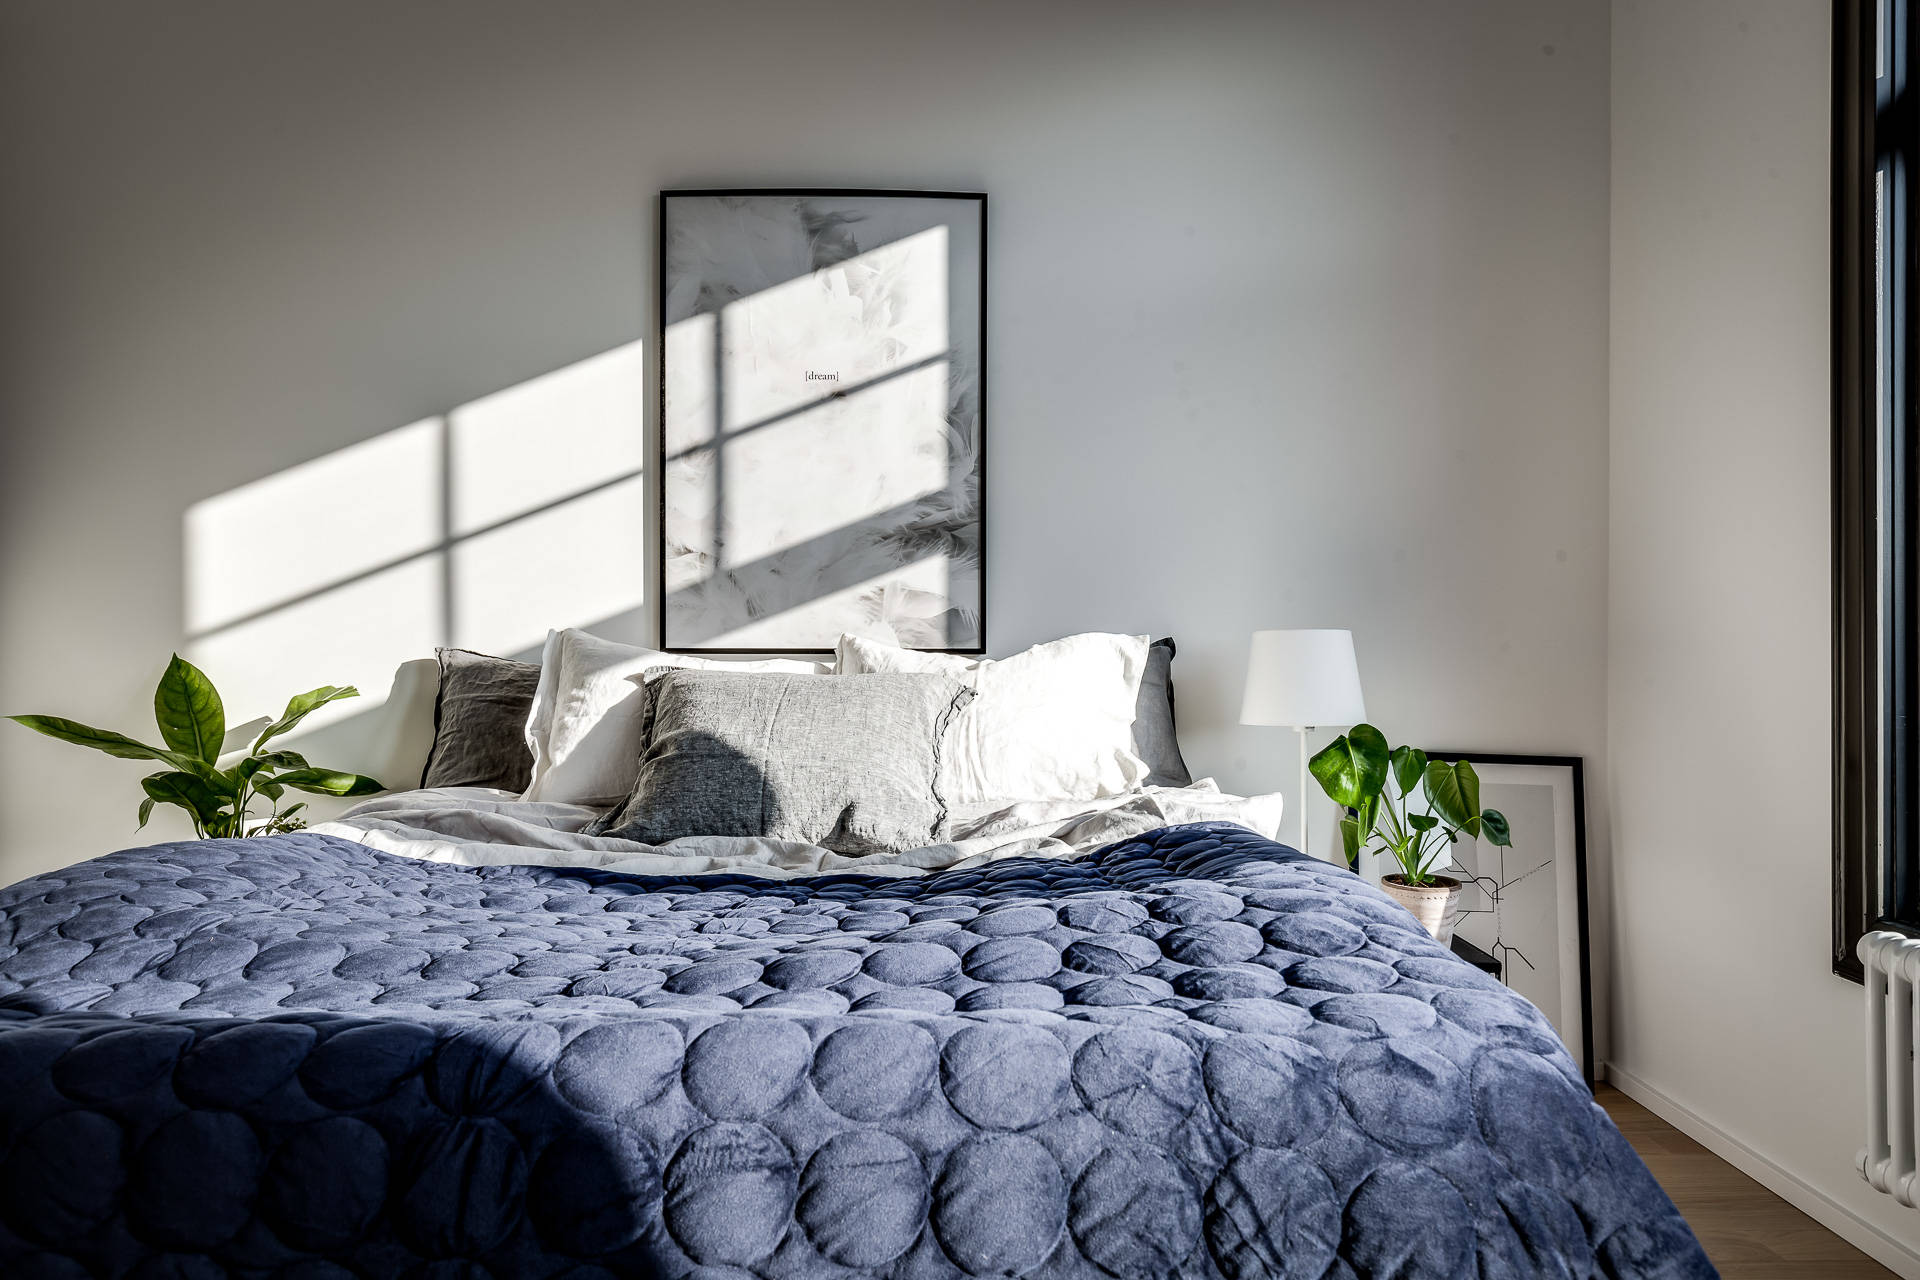 спальня кровать подушки текстиль